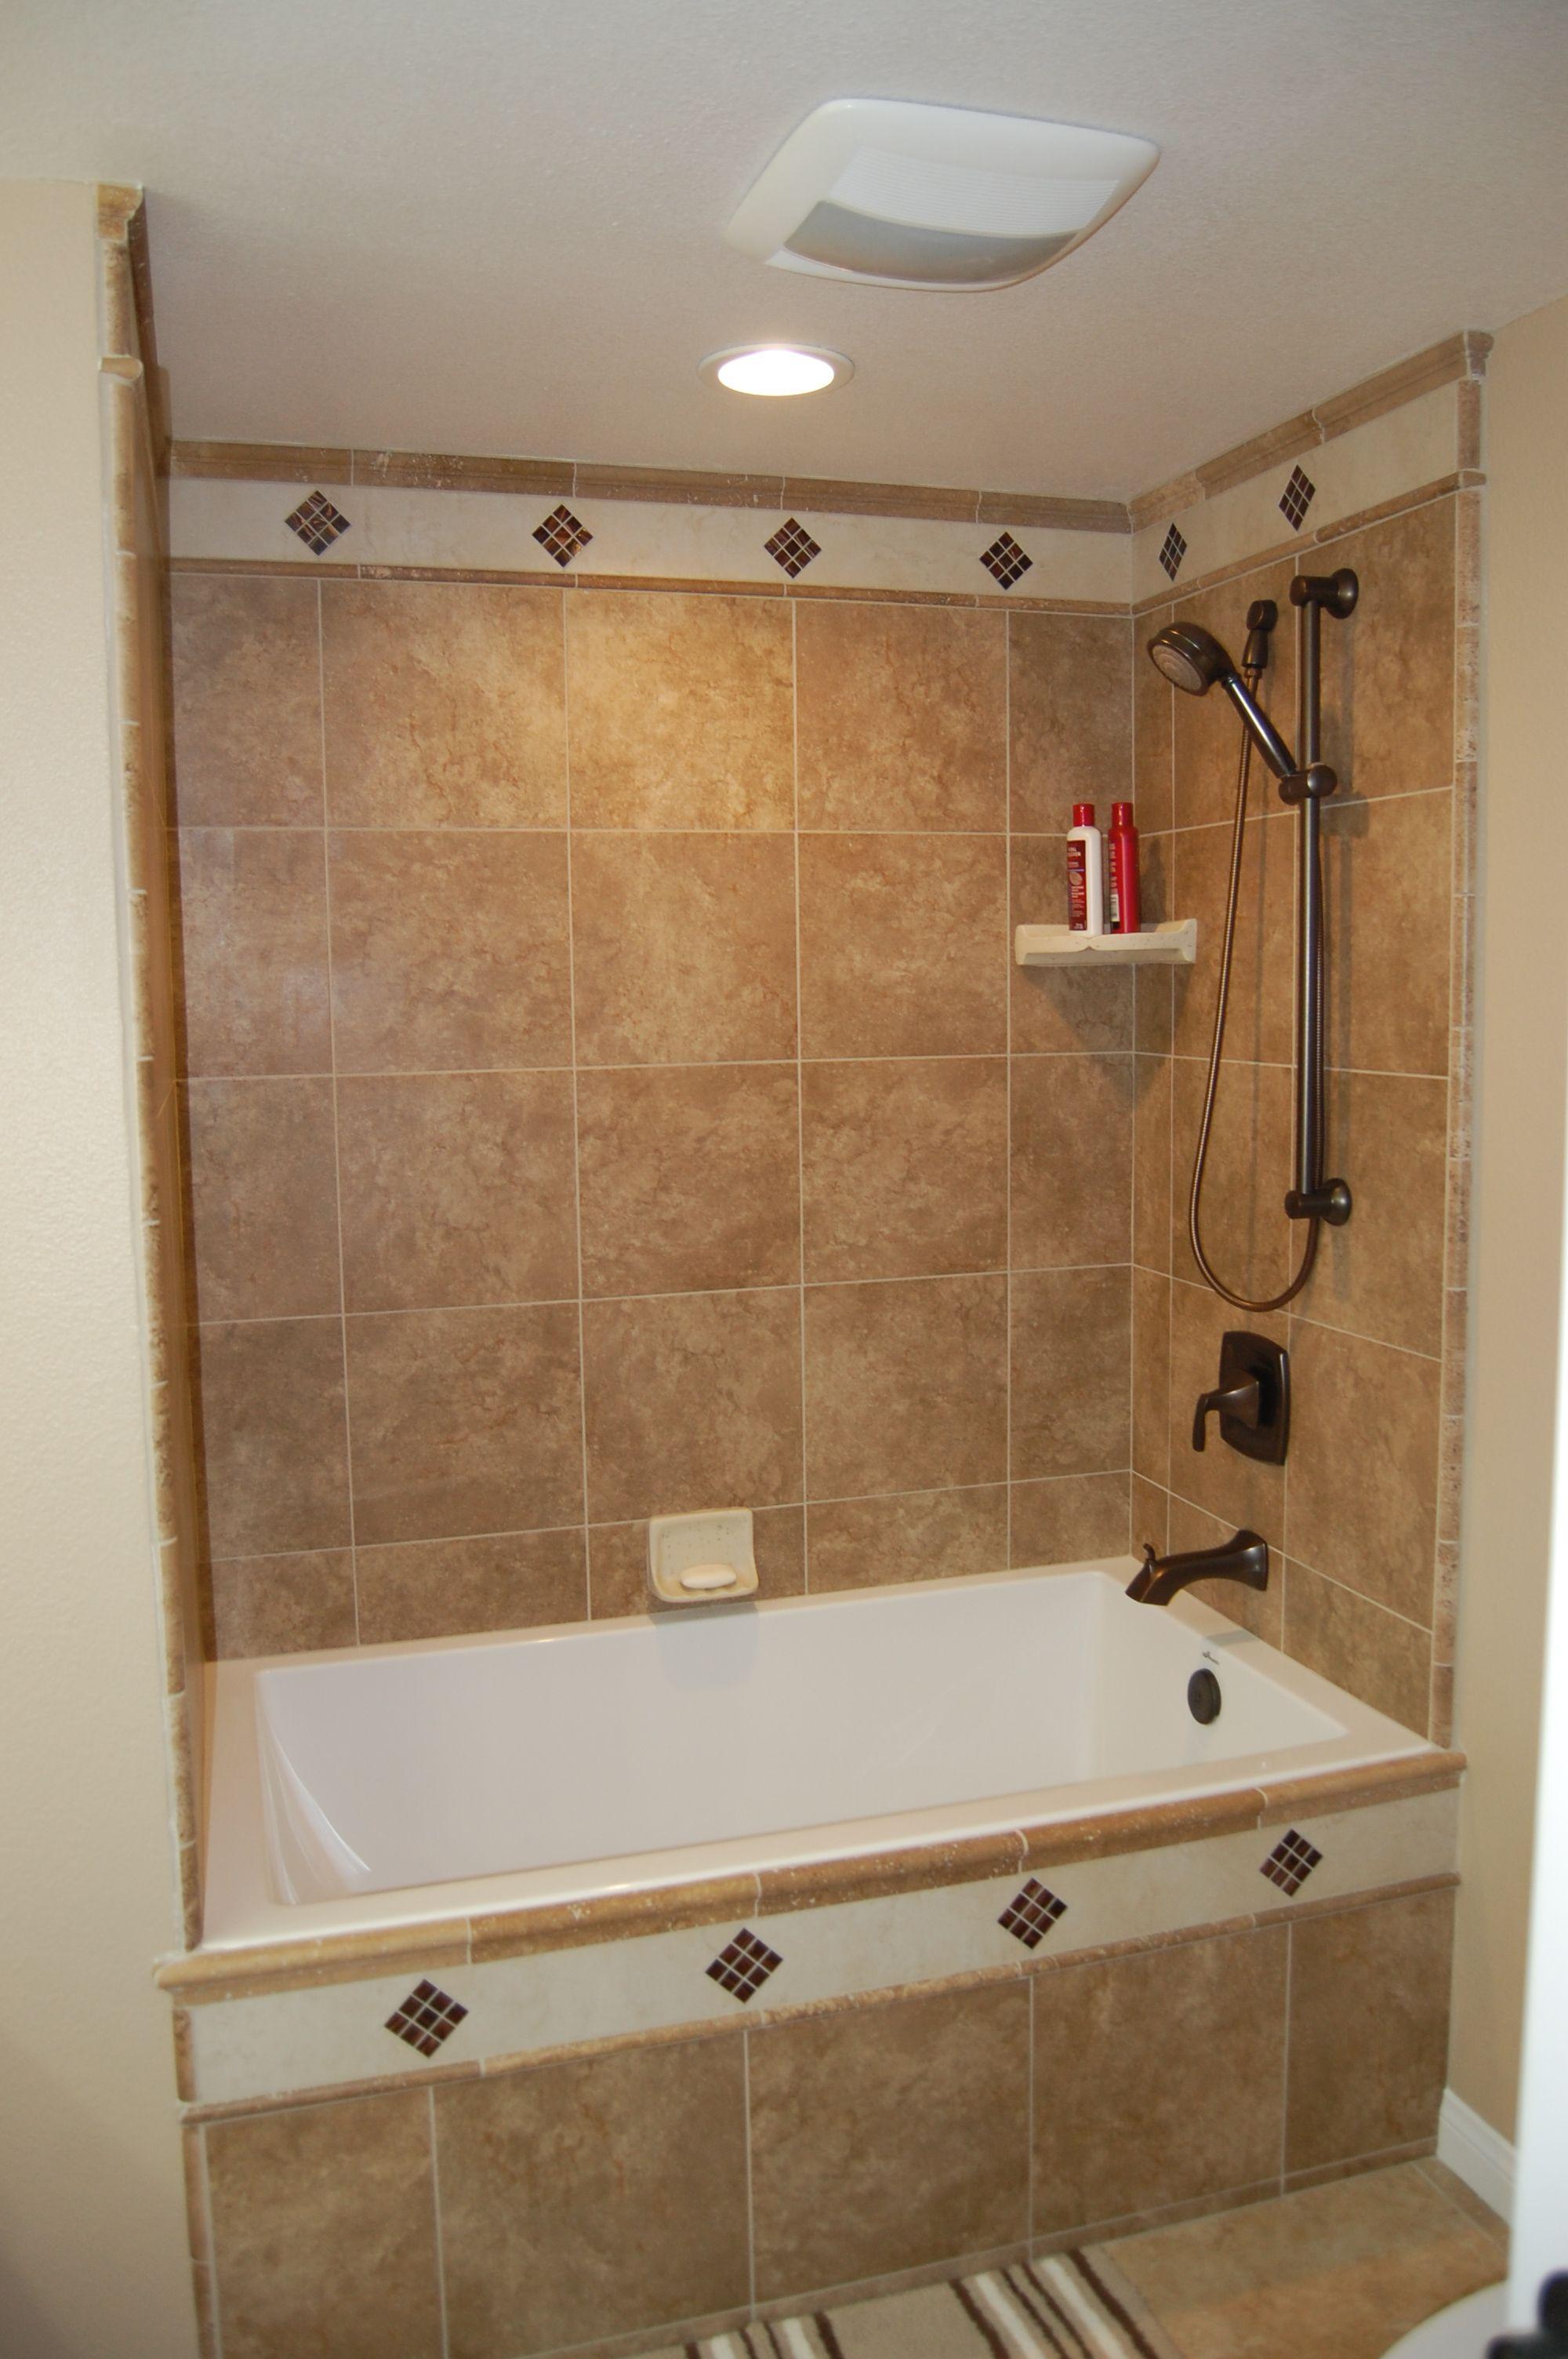 Tile work around shower/ bathtub combo | Bathrooms | Pinterest ...